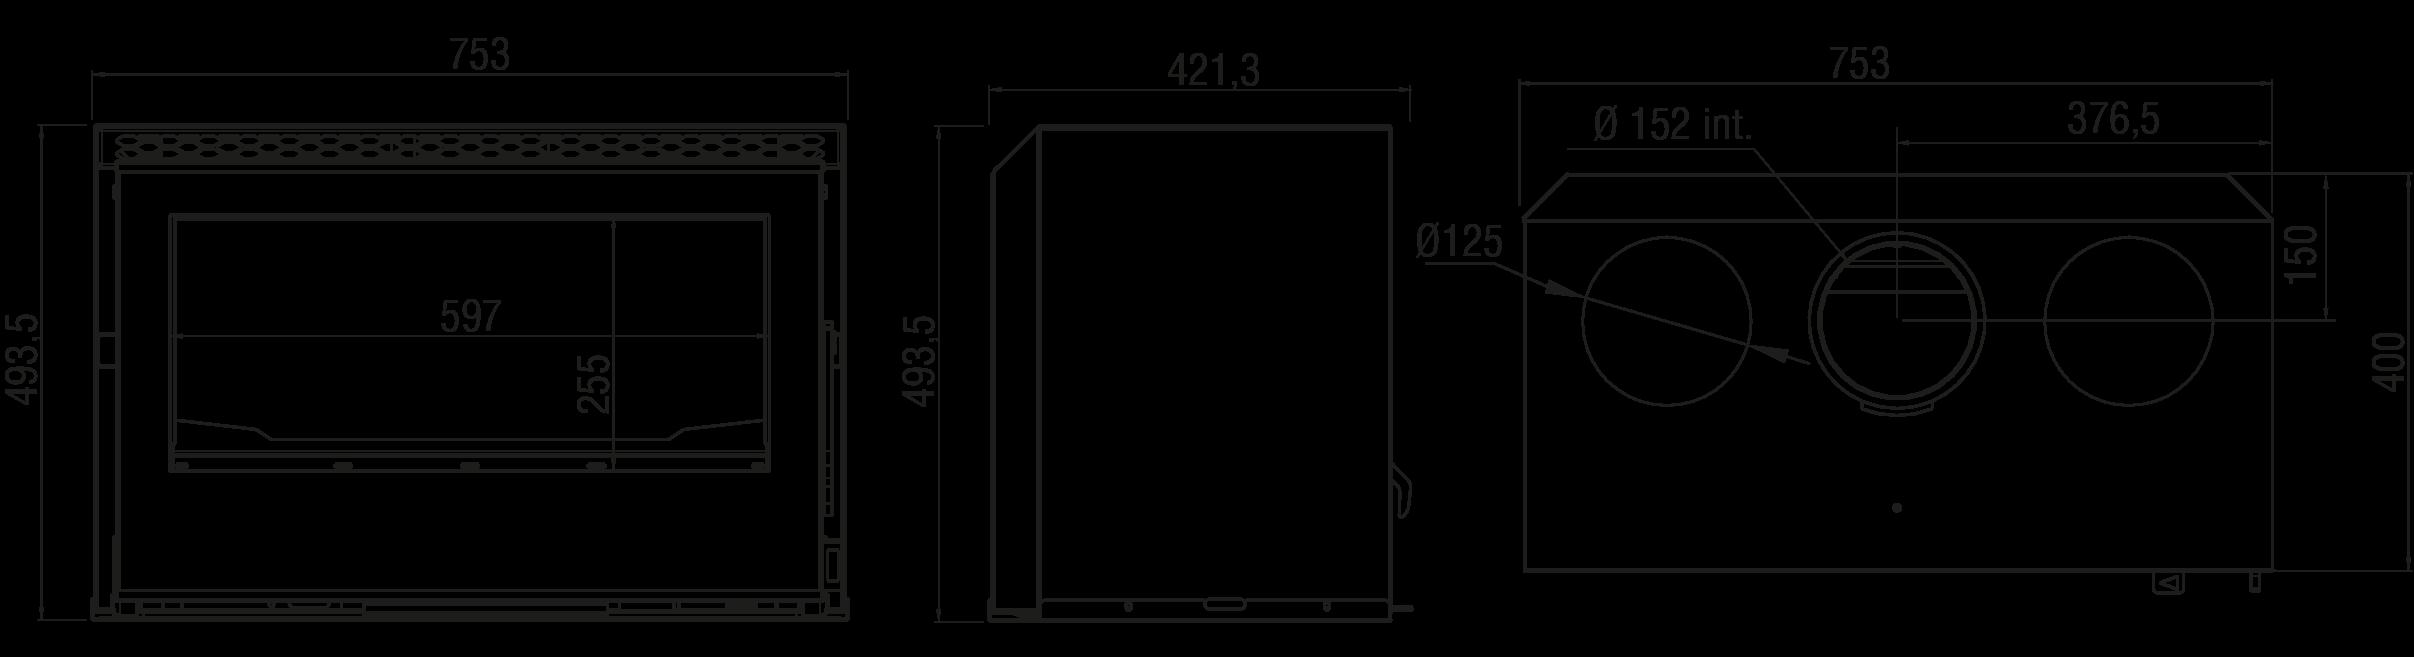 Esquema de AXIS Diseño chimeneas INSERT 650